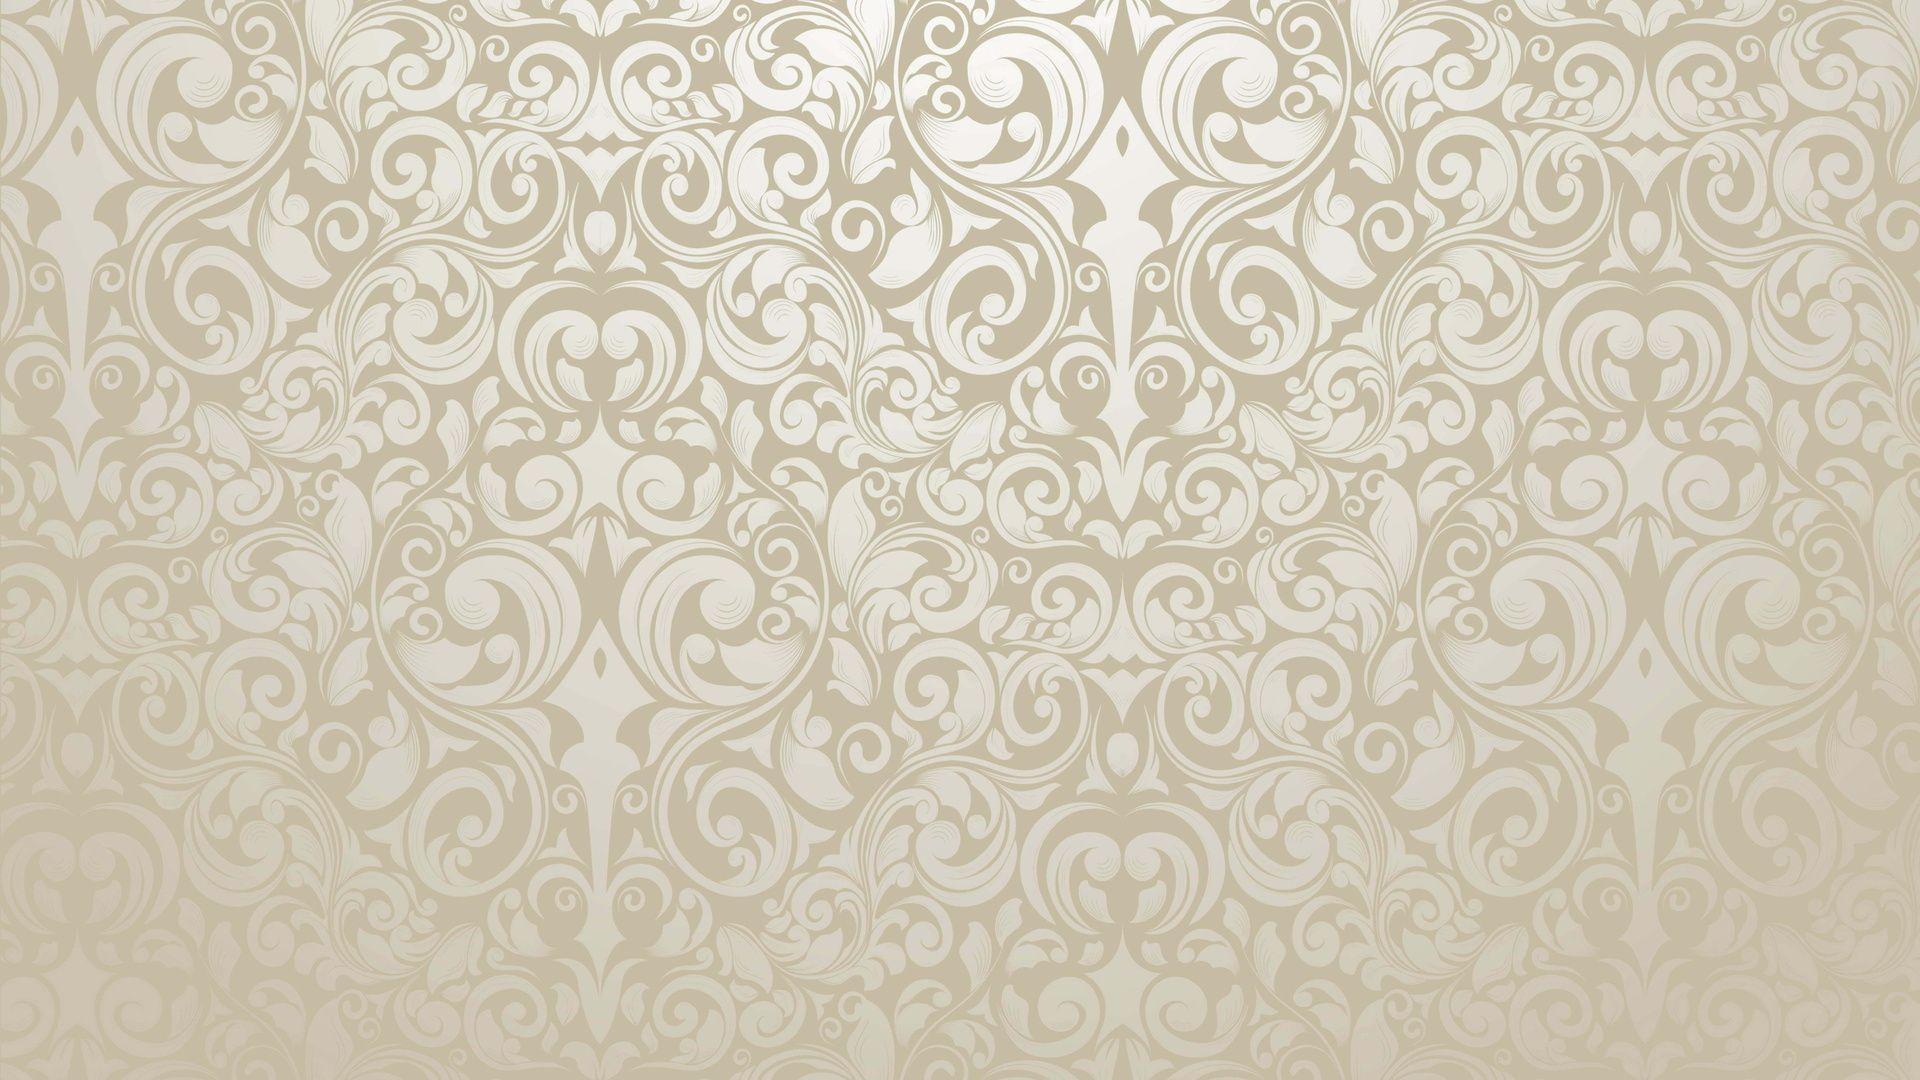 Floral Wallpaper X